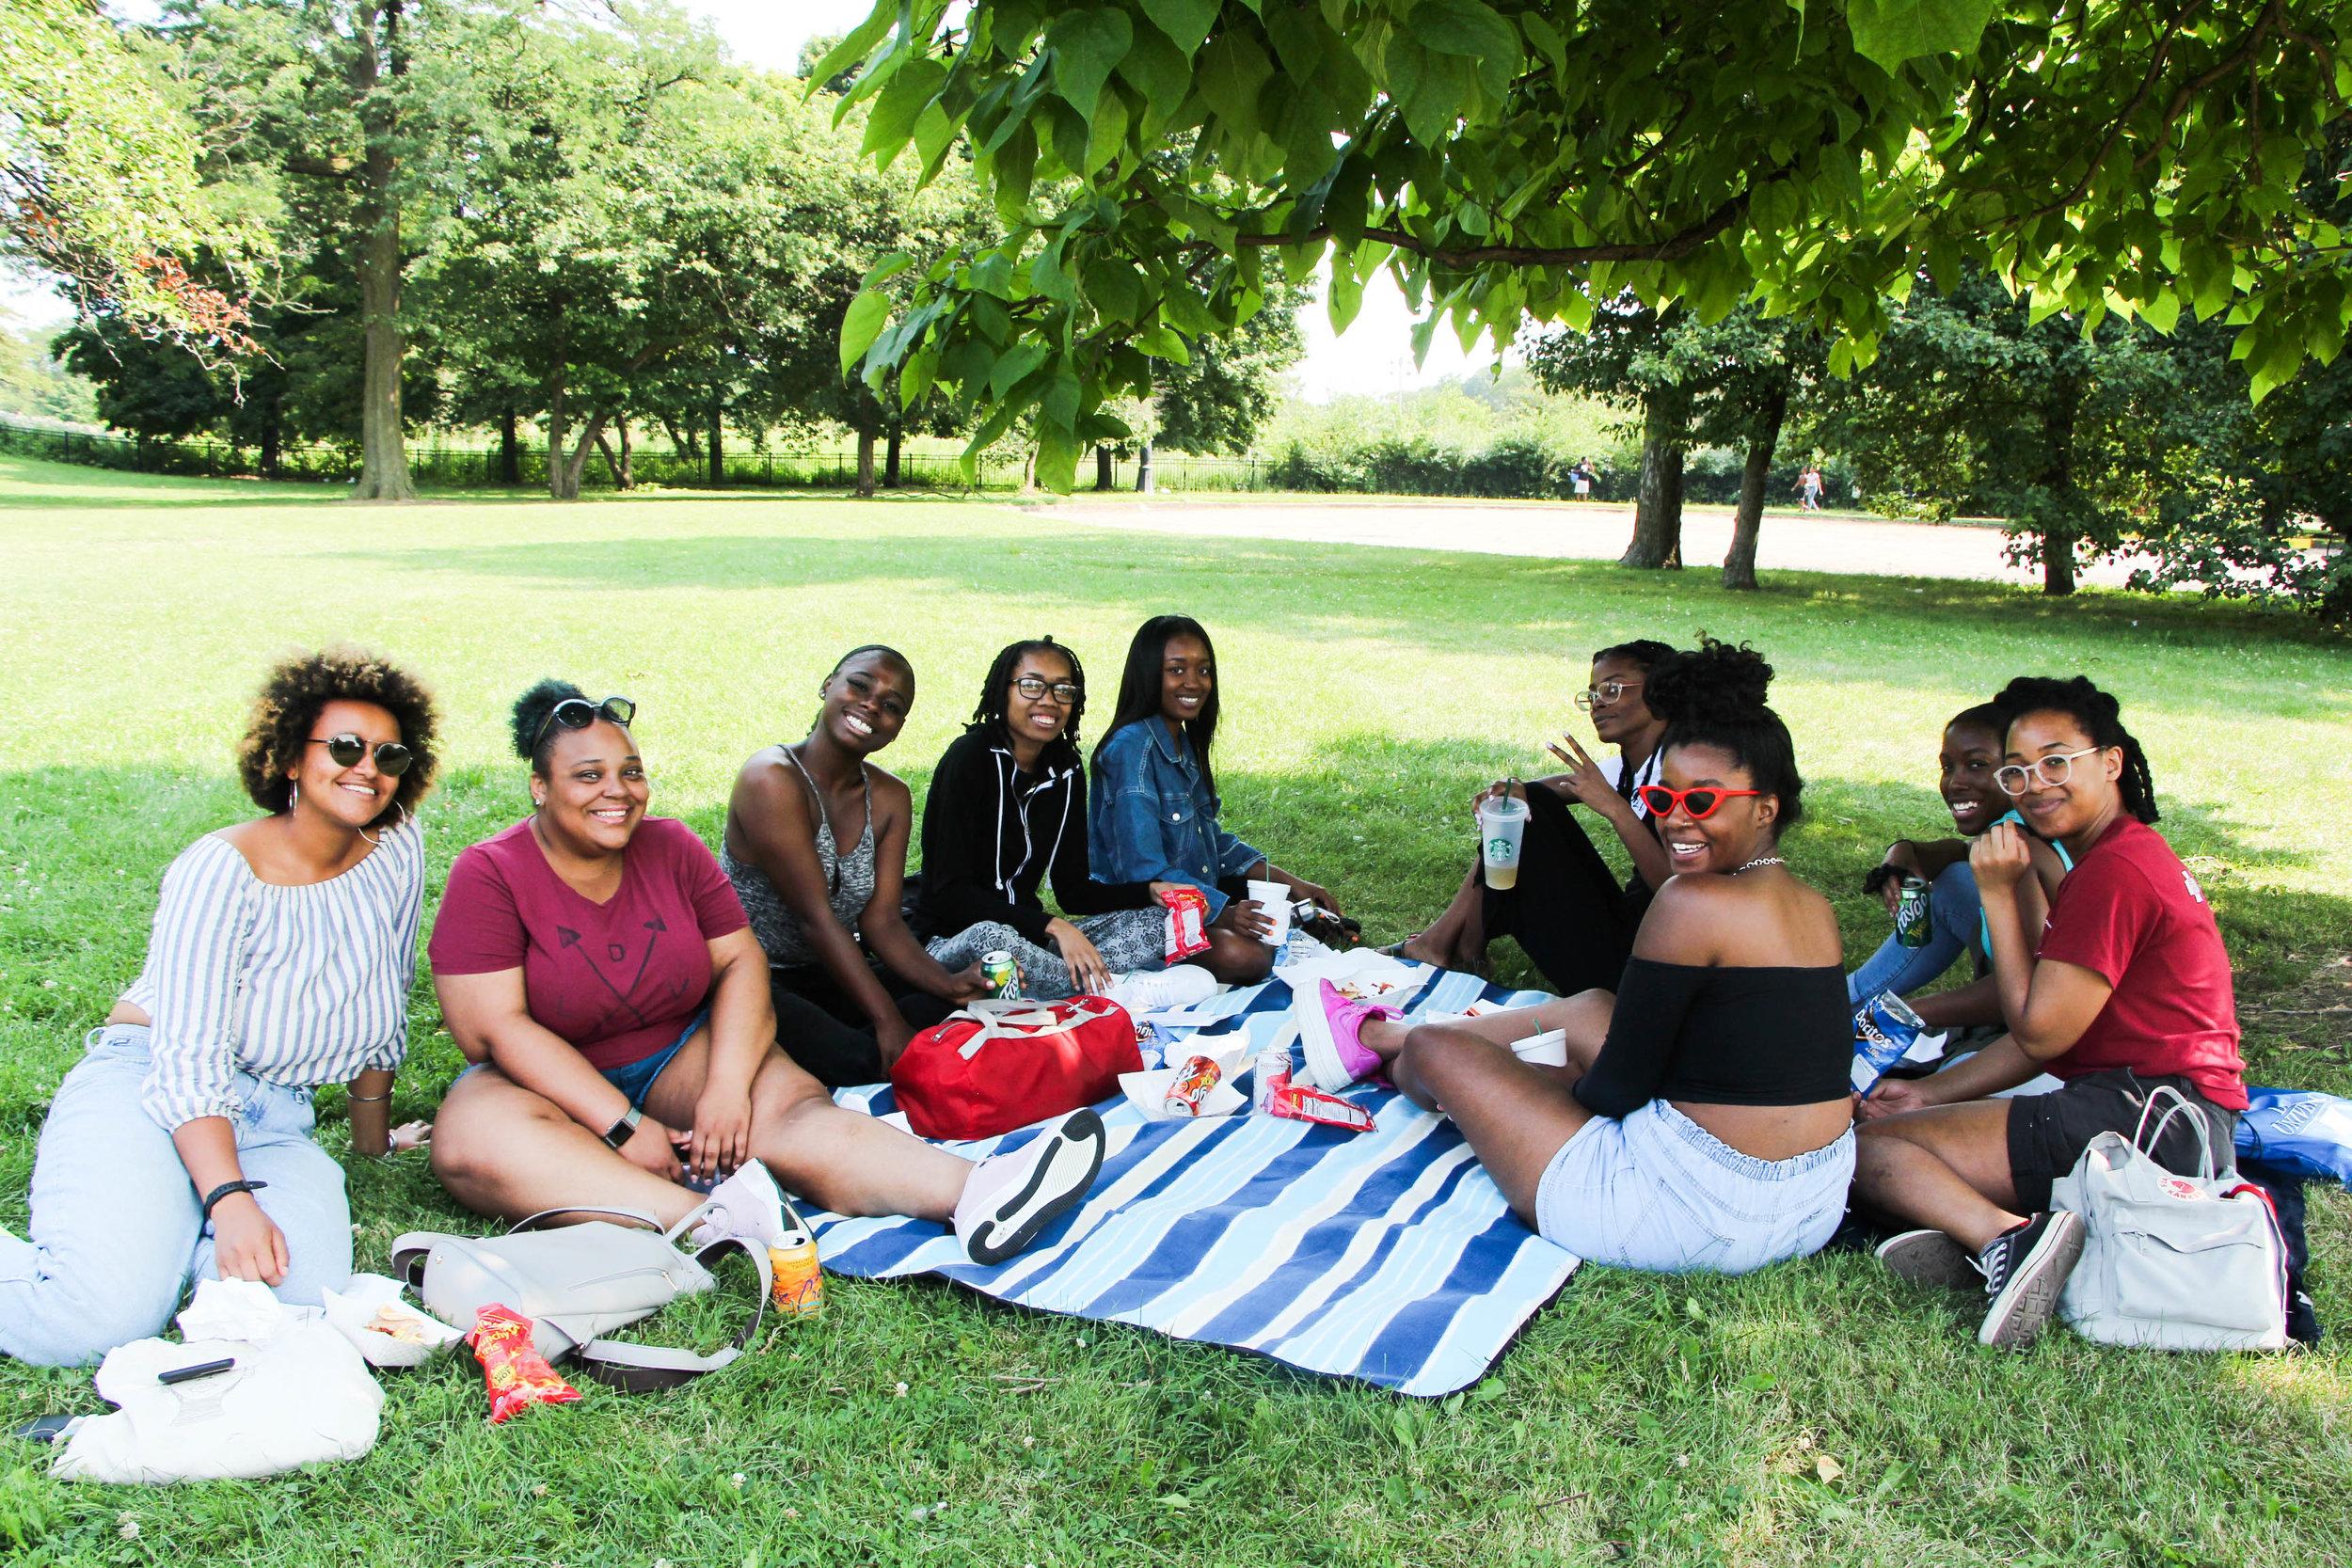 InPathways Flash Forward participants enjoy some shade at Mid-Summer Fun Fest